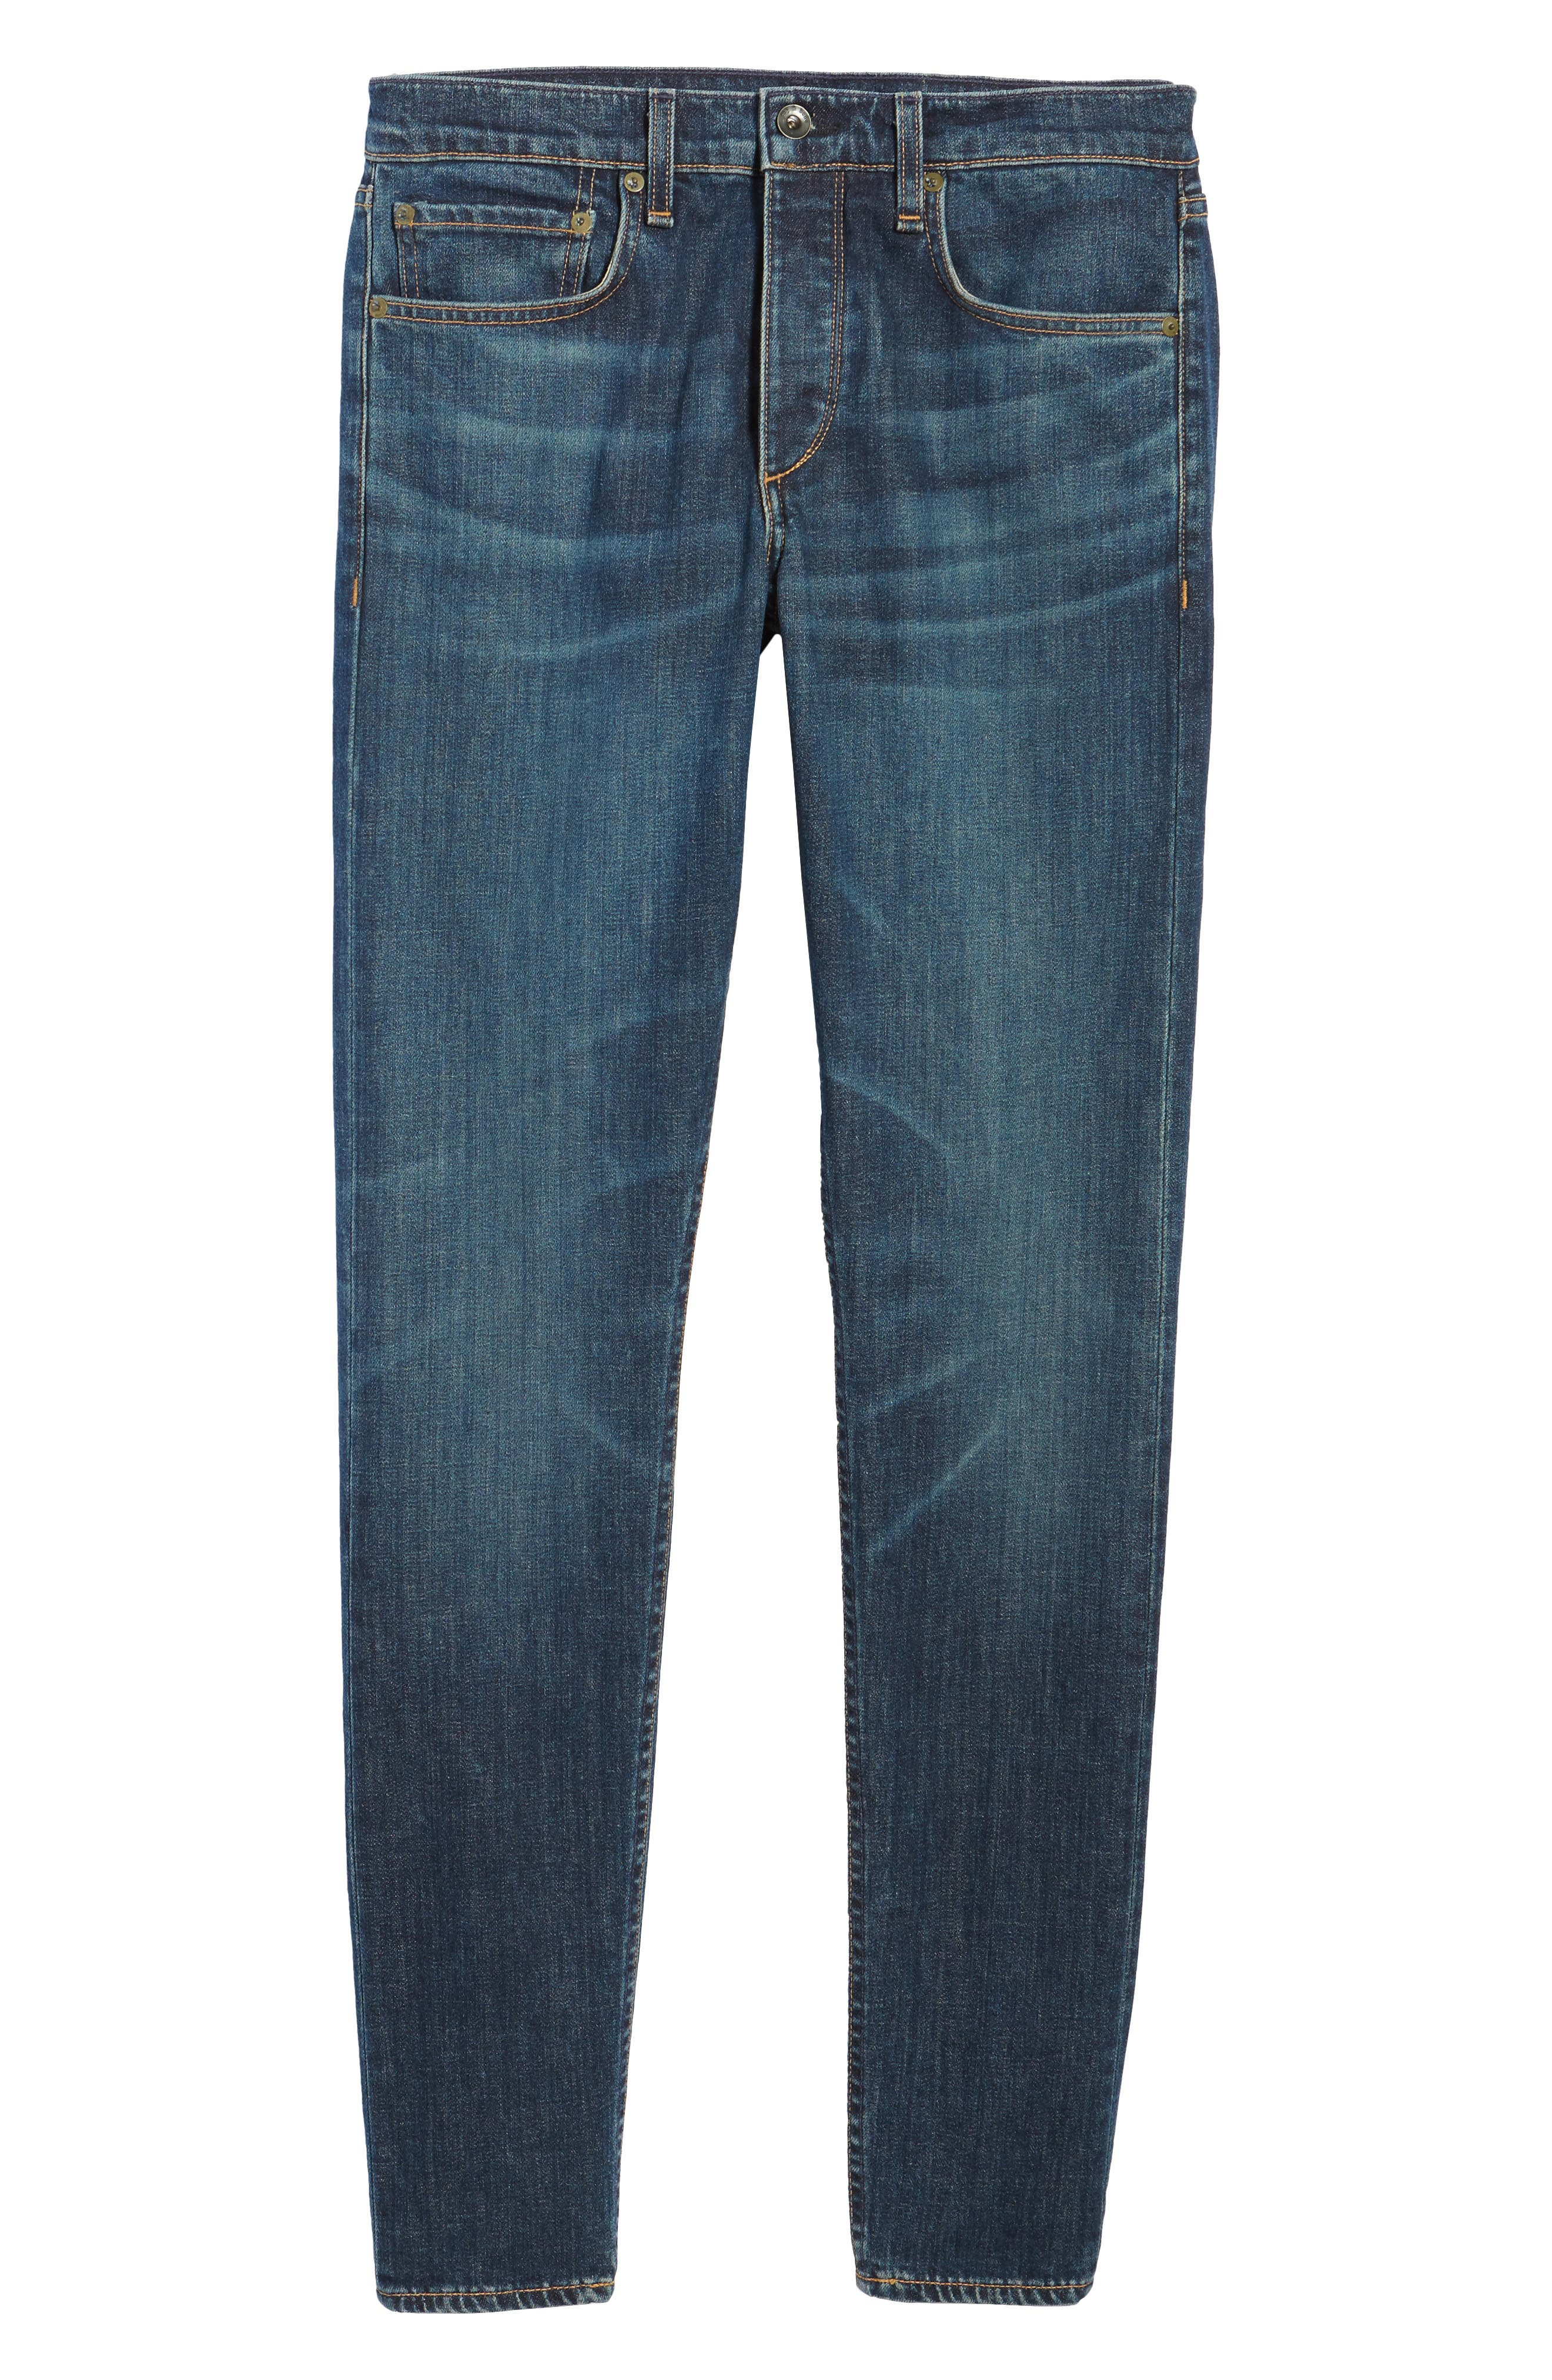 Fit 1 Skinny Fit Jeans,                             Alternate thumbnail 5, color,                             Linden